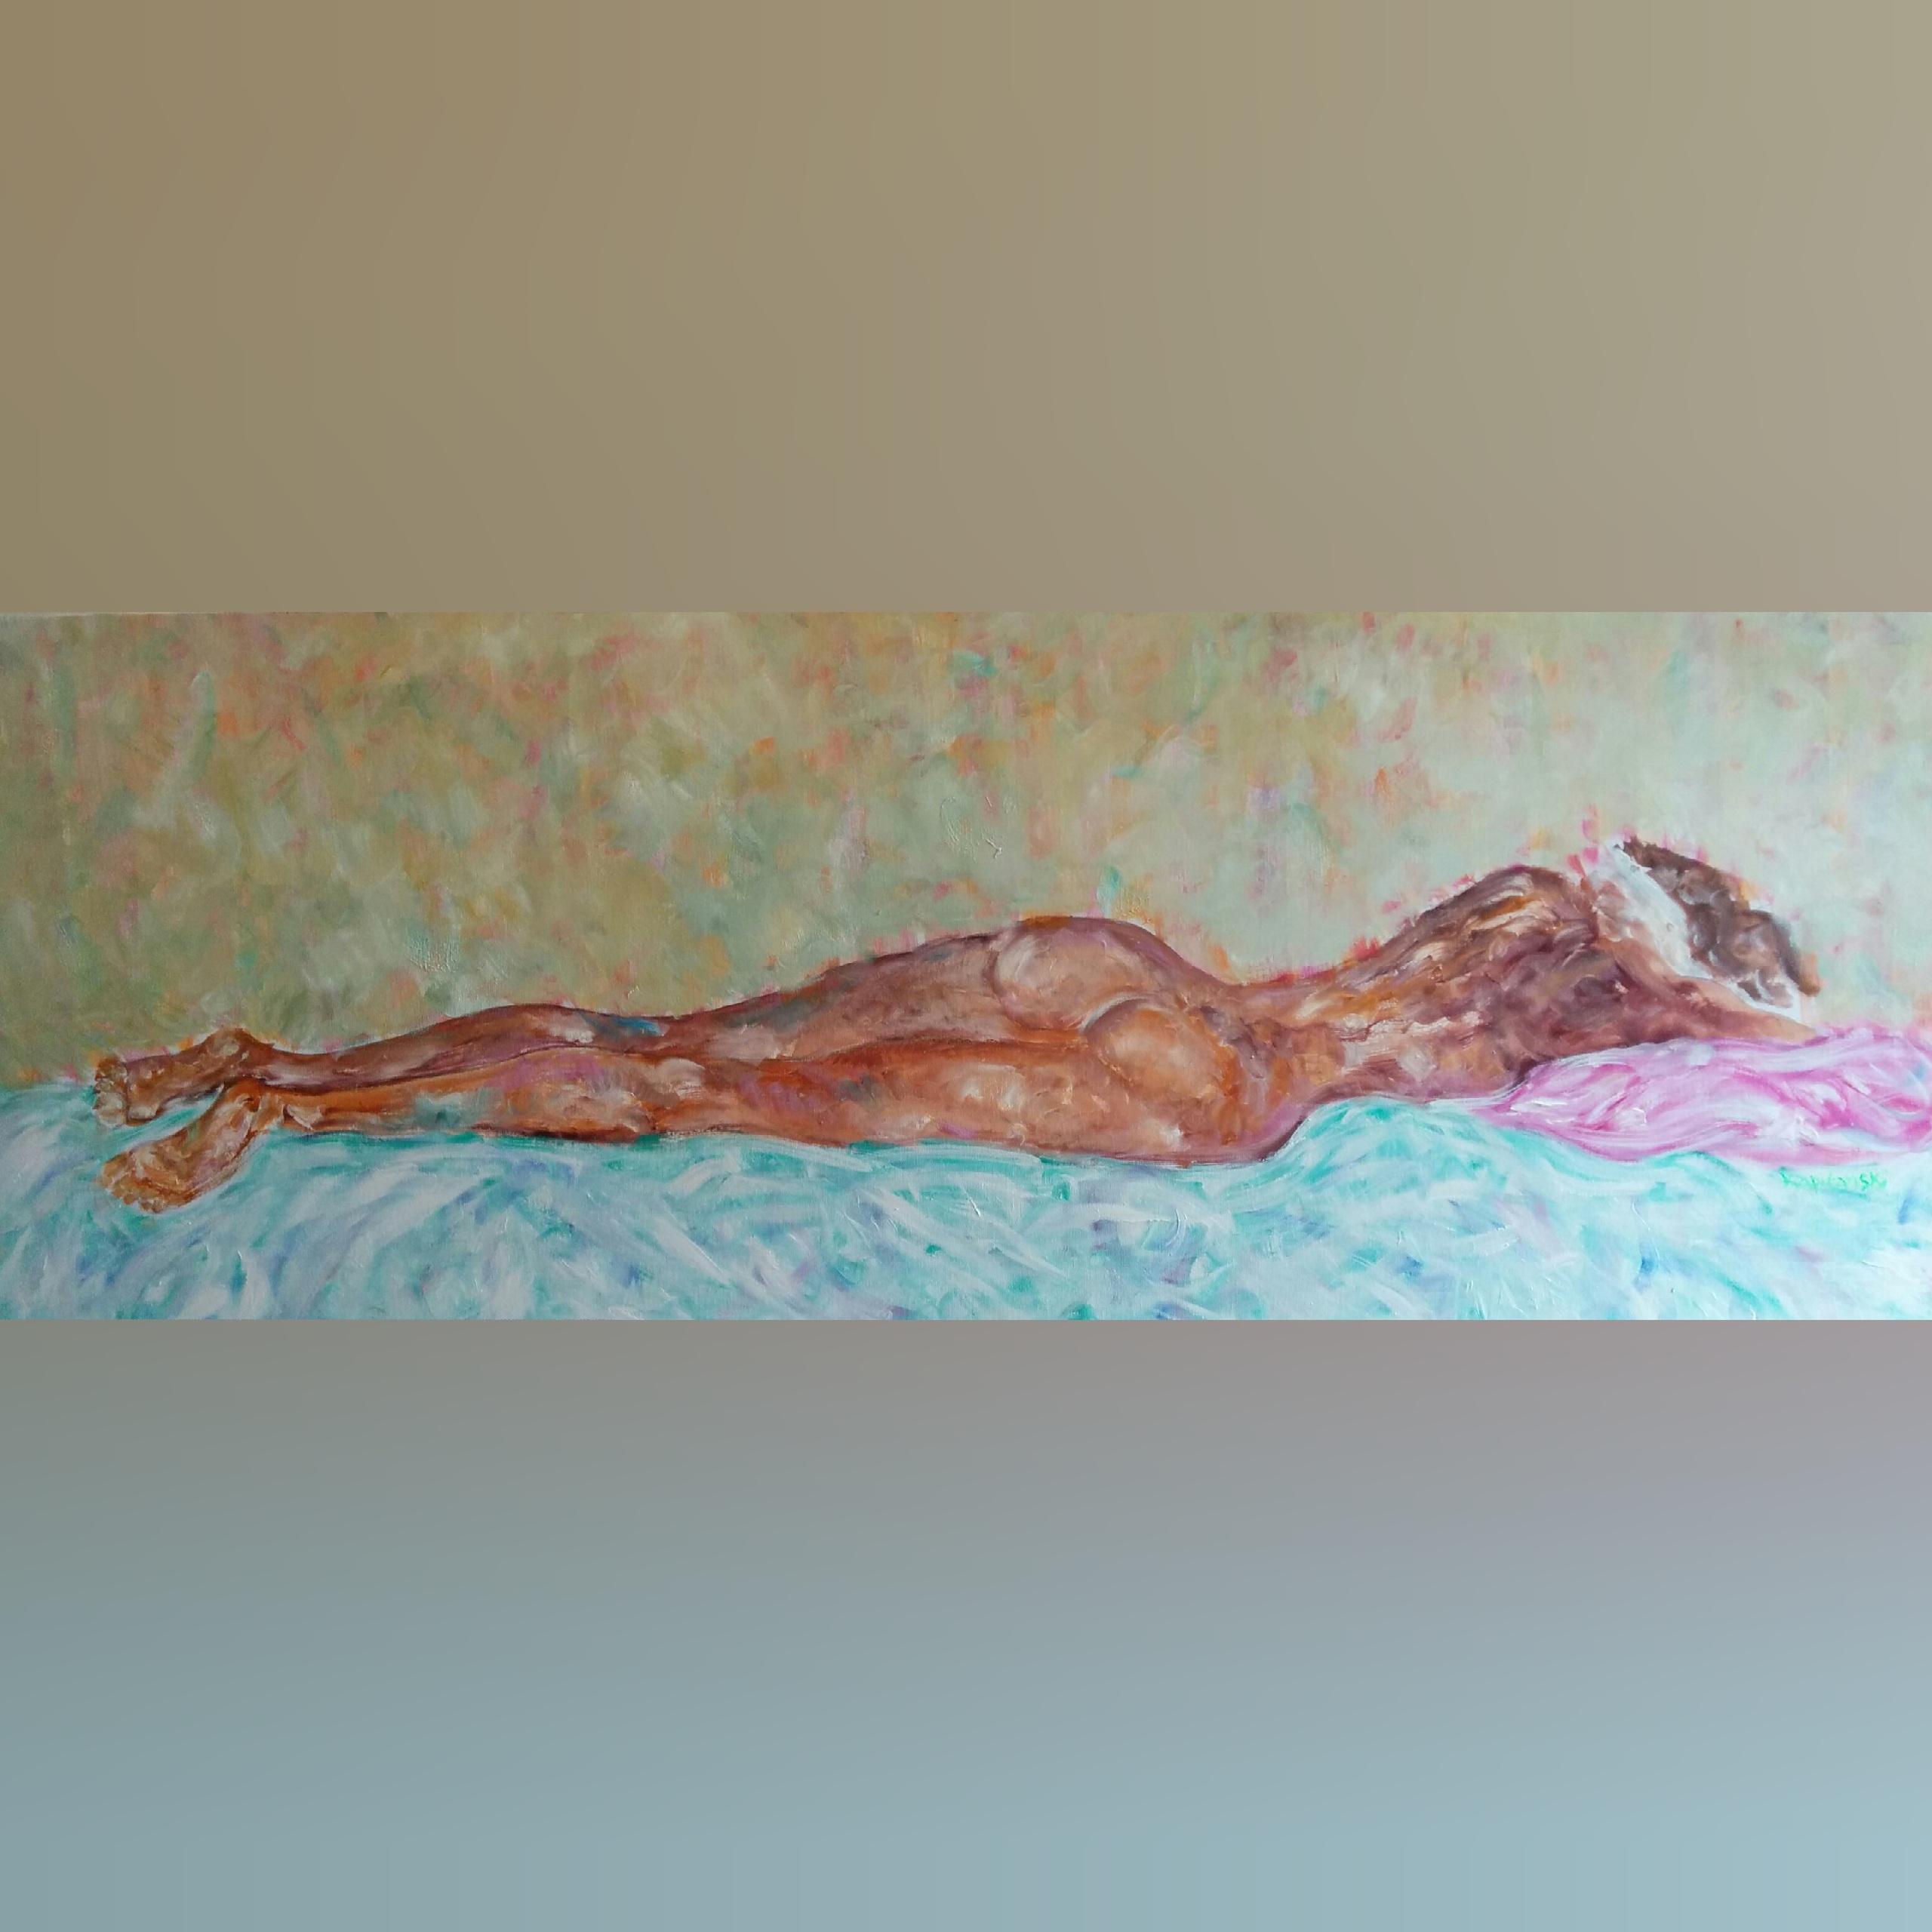 Paintings for sale, Картини за продажба, Cuban woman, Кубинка